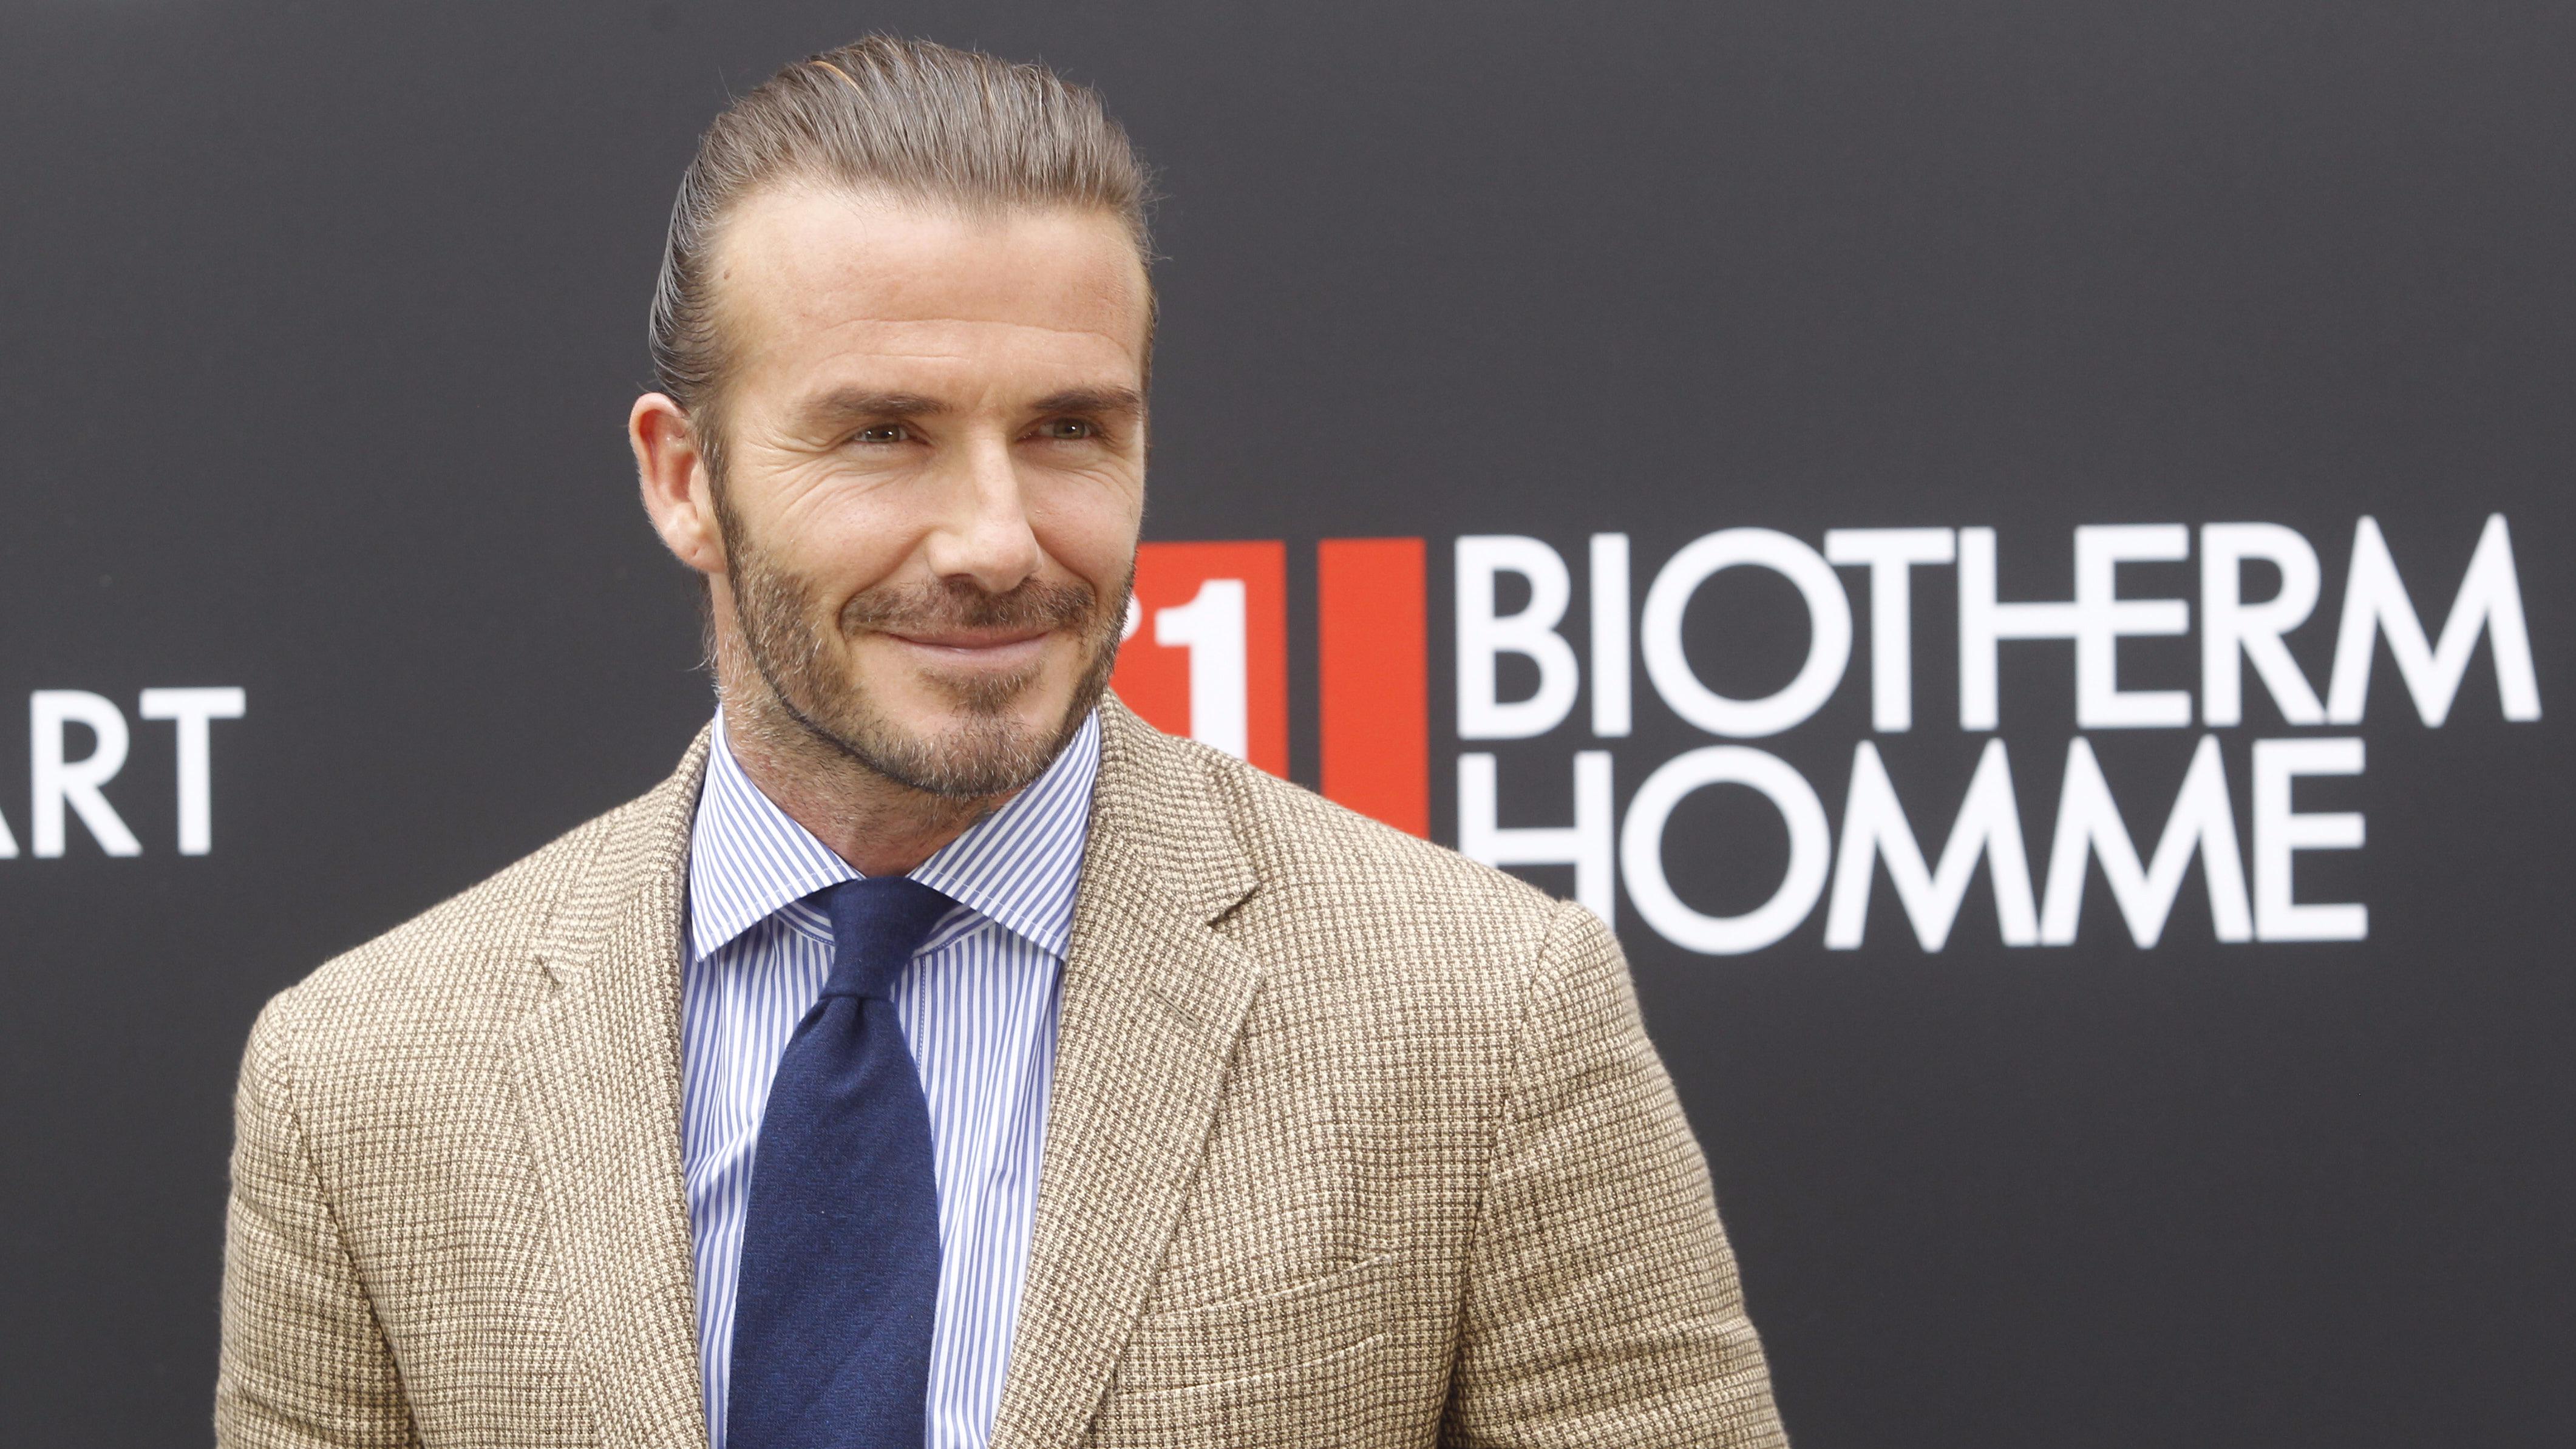 David Beckham Shuts Down A Fan After 'Botox' Claim